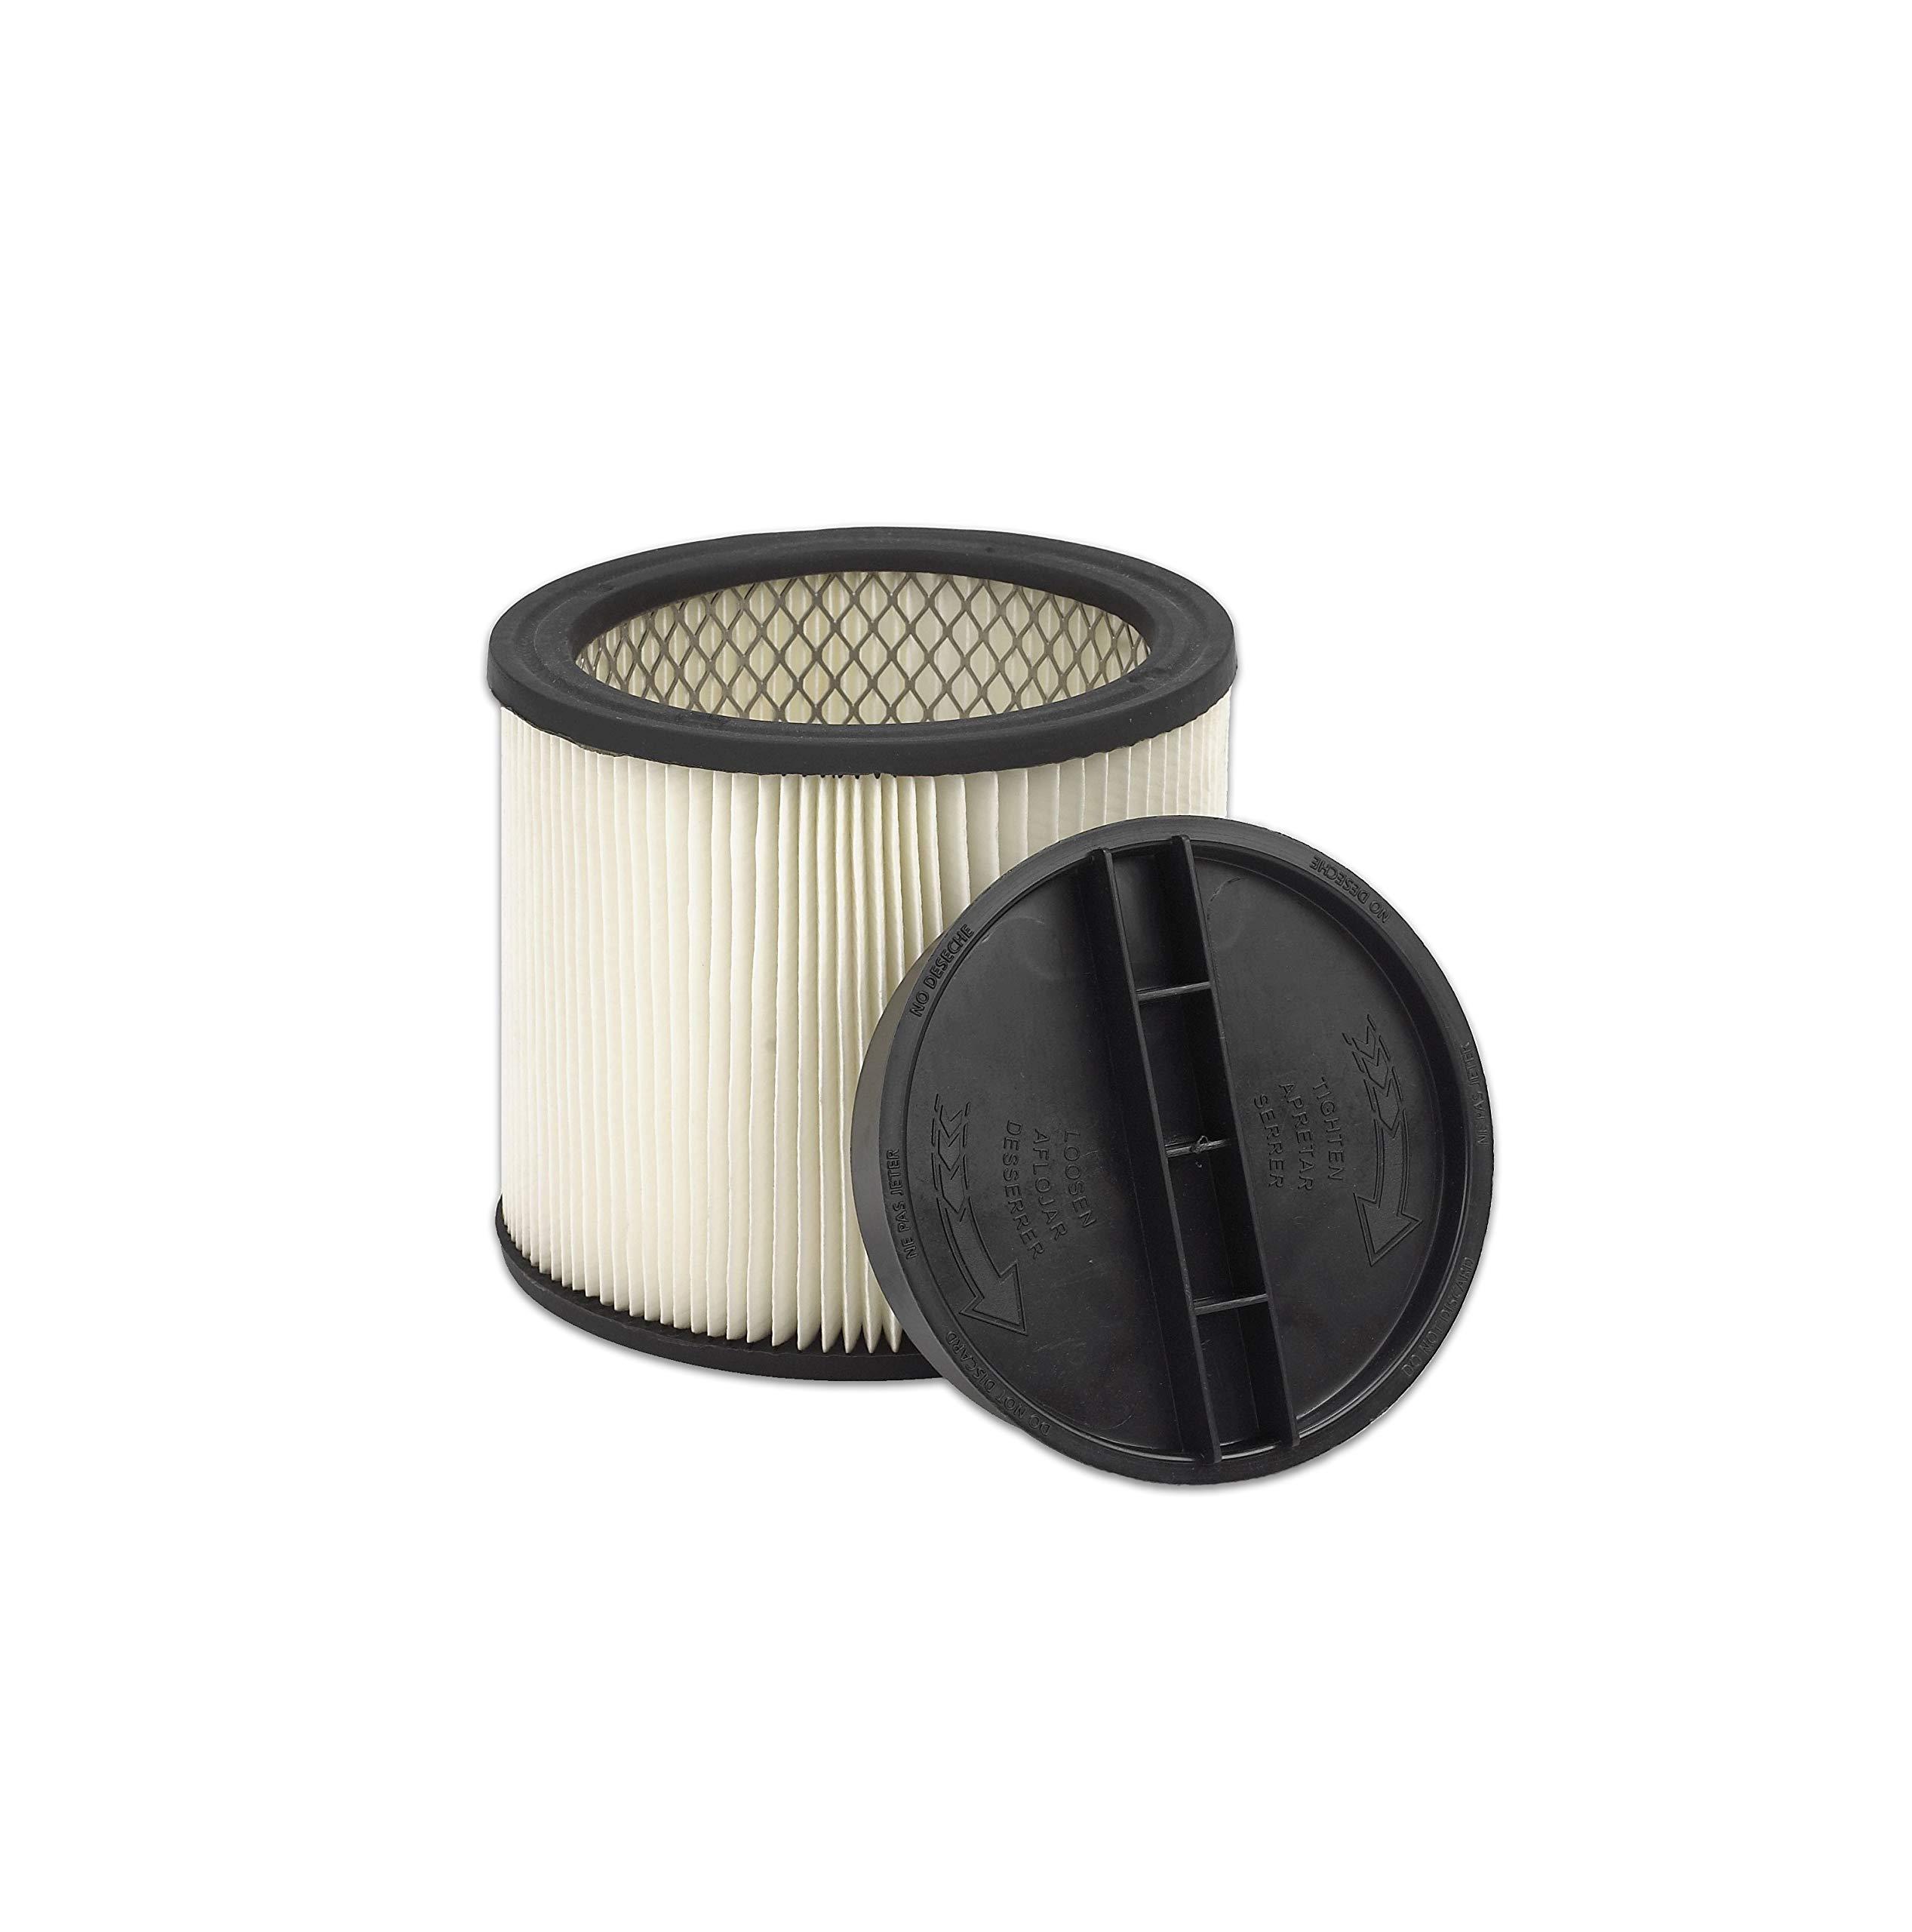 Shop-Vac 90304 Cartridge Filter, 4 Pack